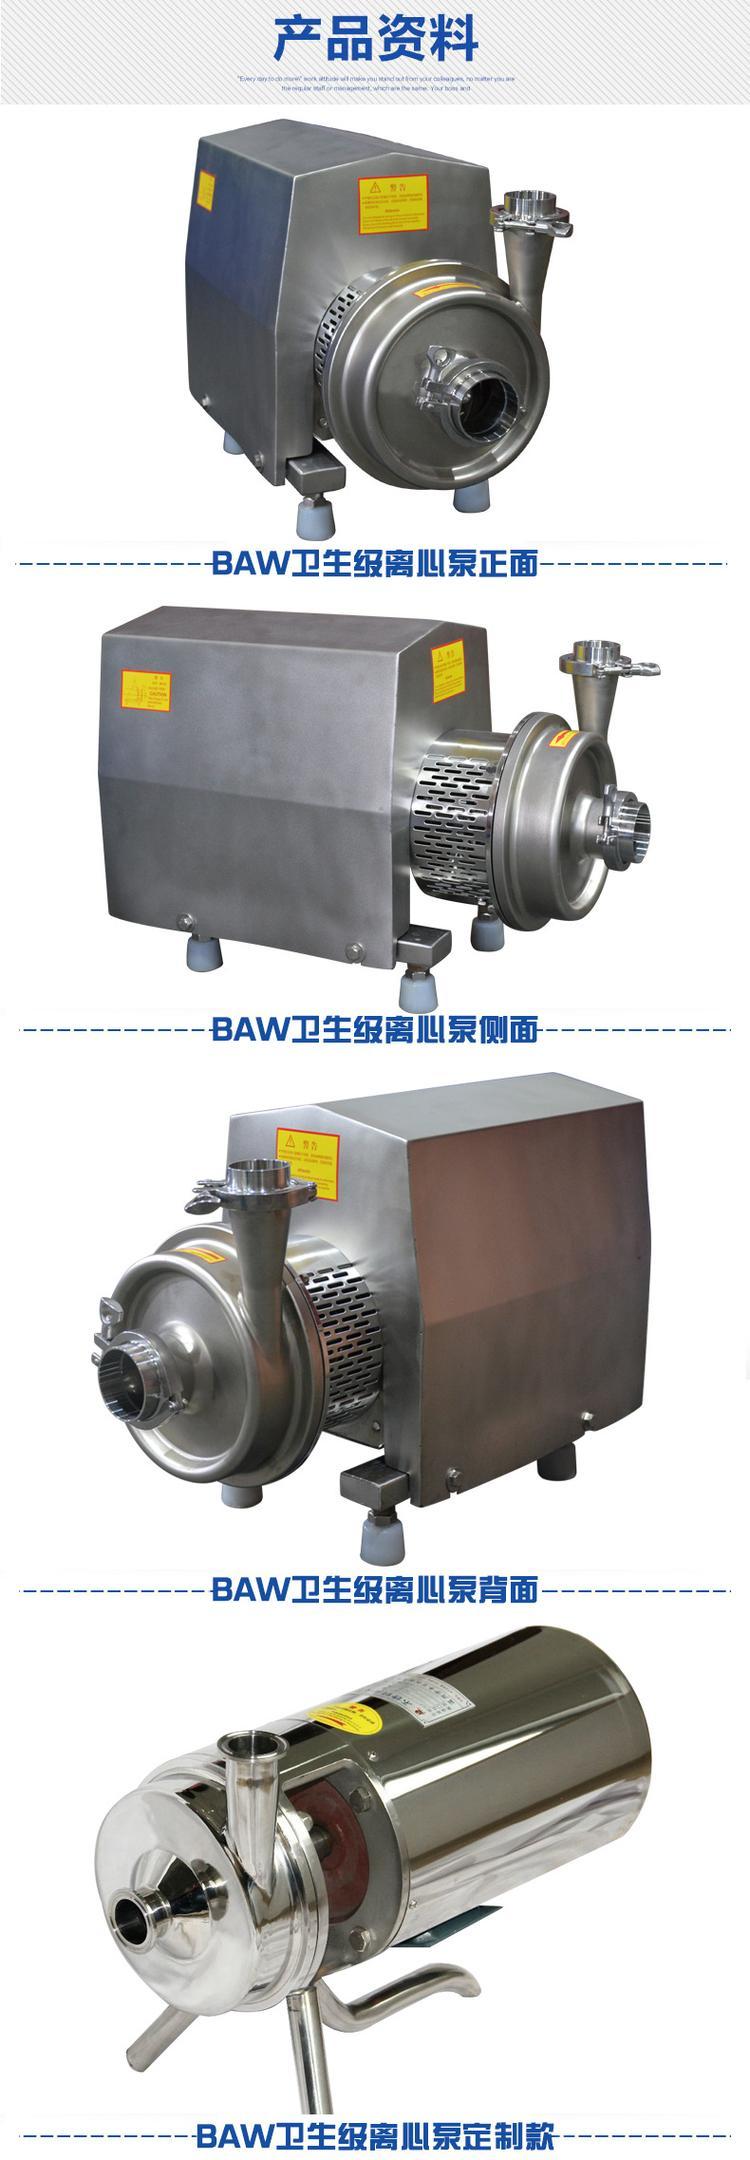 BAW卫生级离心泵.jpg